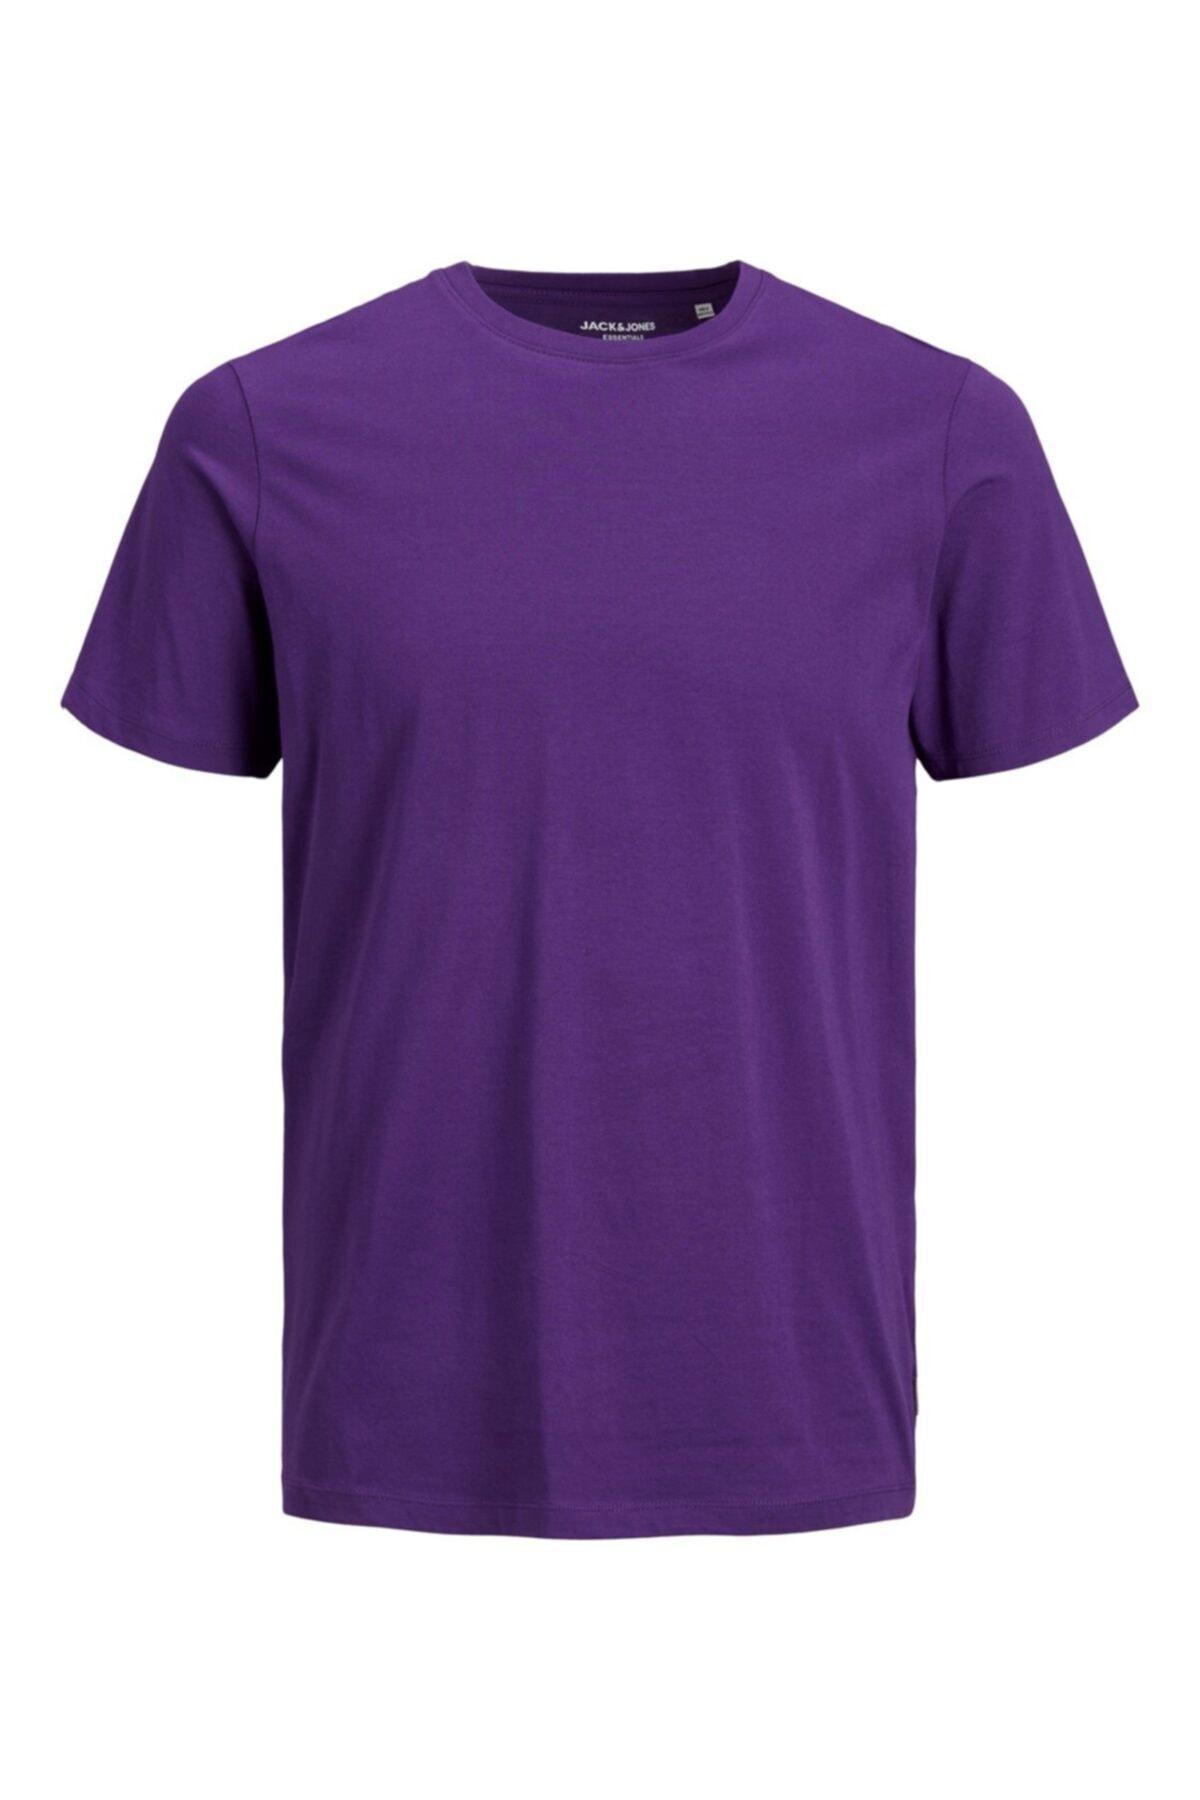 Jack & Jones Erkek Jjeorganıc Basıc Tee Ss O-neck Noos T-shirt 12156101 1